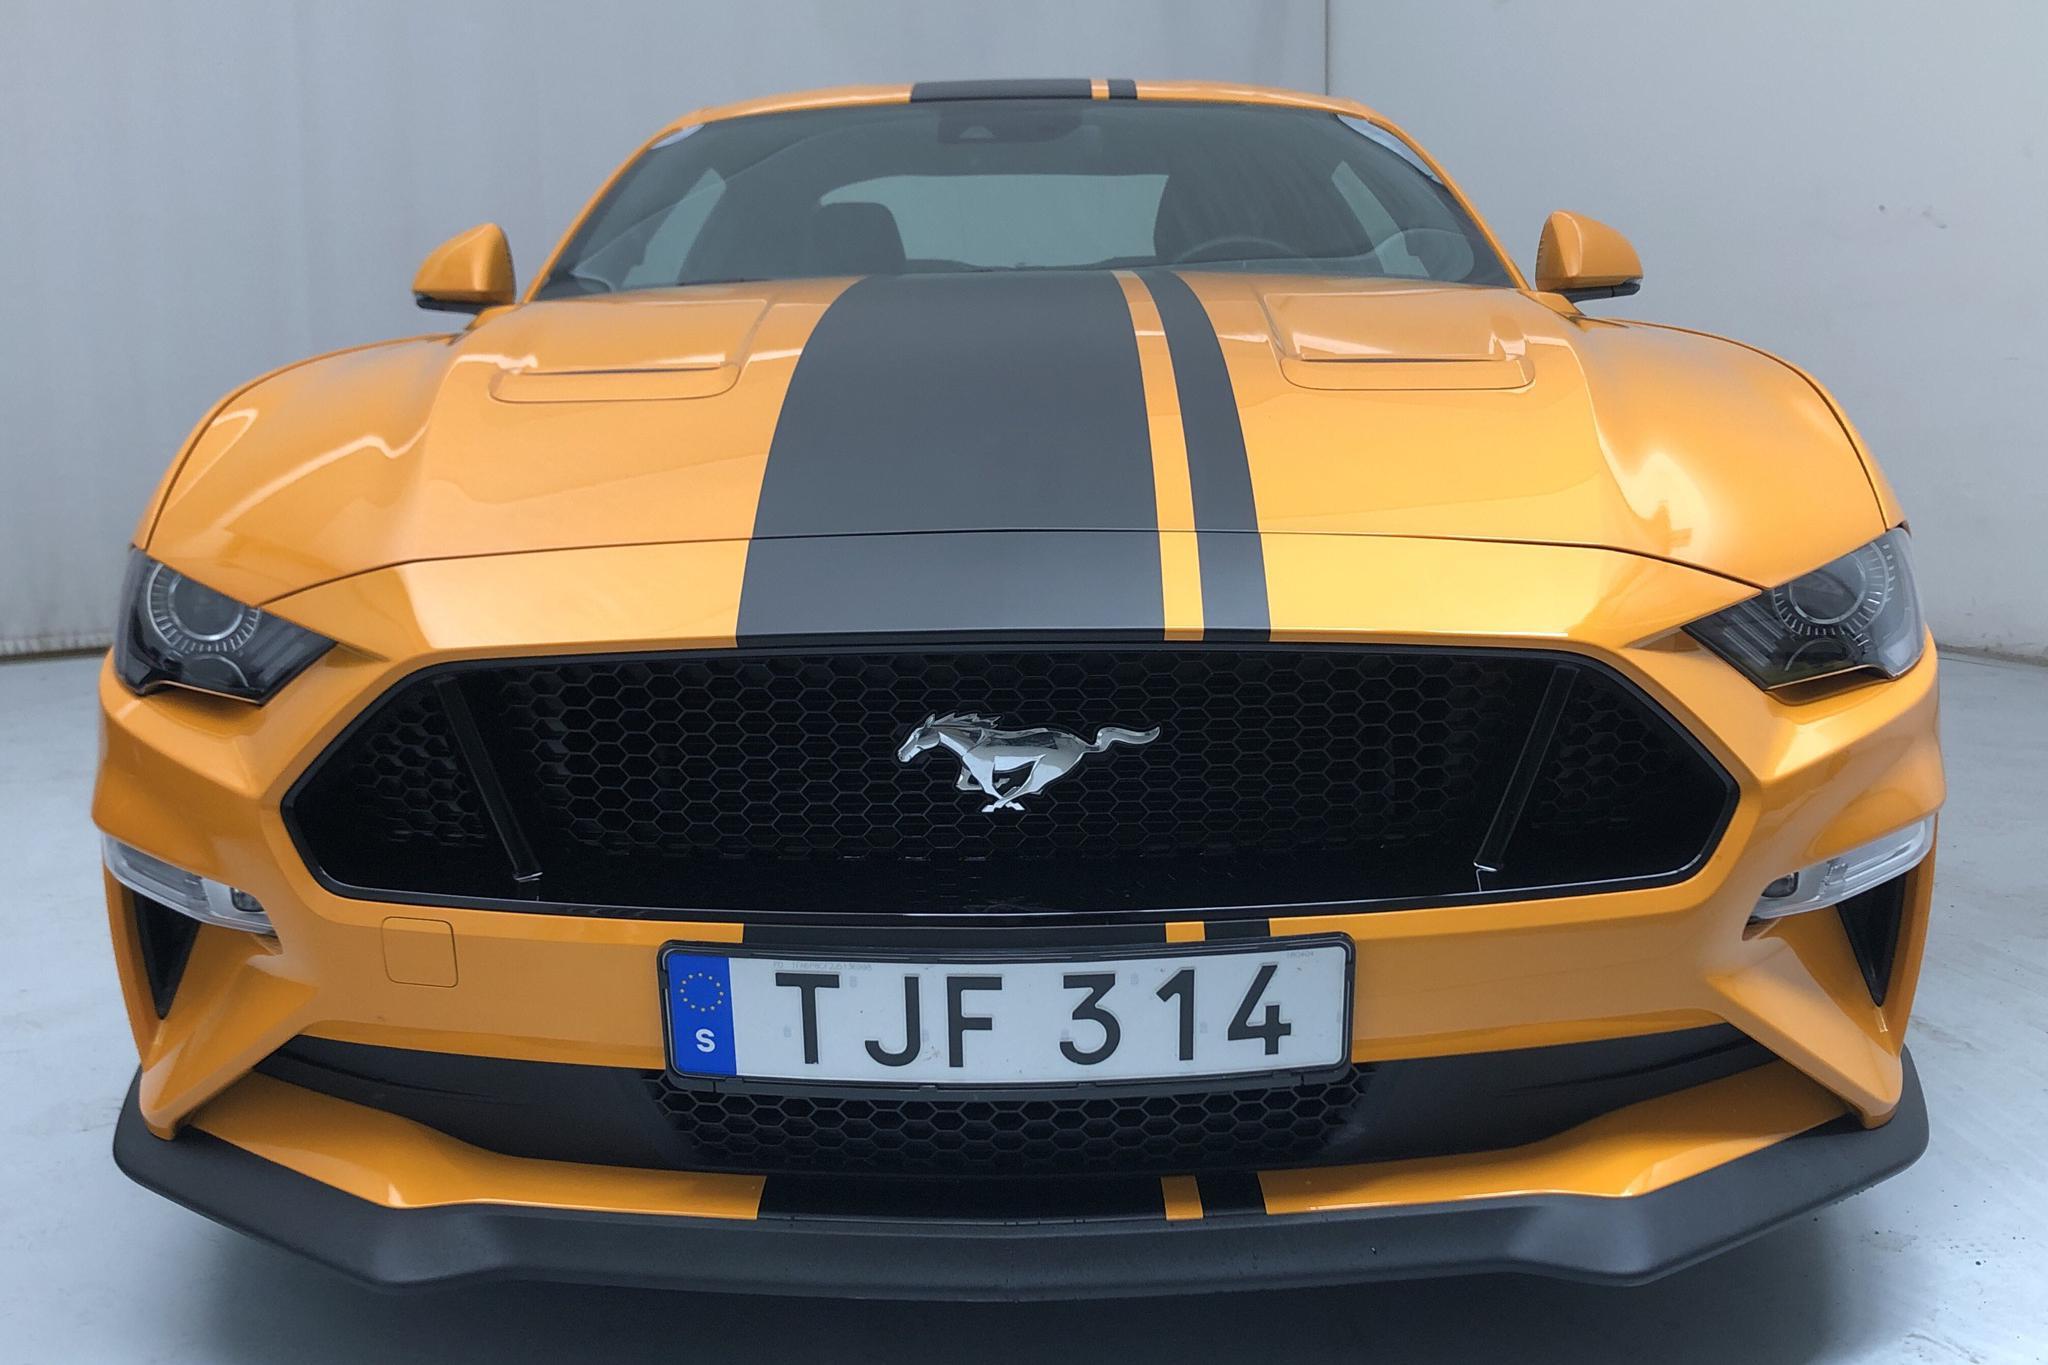 Ford Mustang GT V8 Fastback (450hk) - 8 980 km - Automatic - orange - 2018